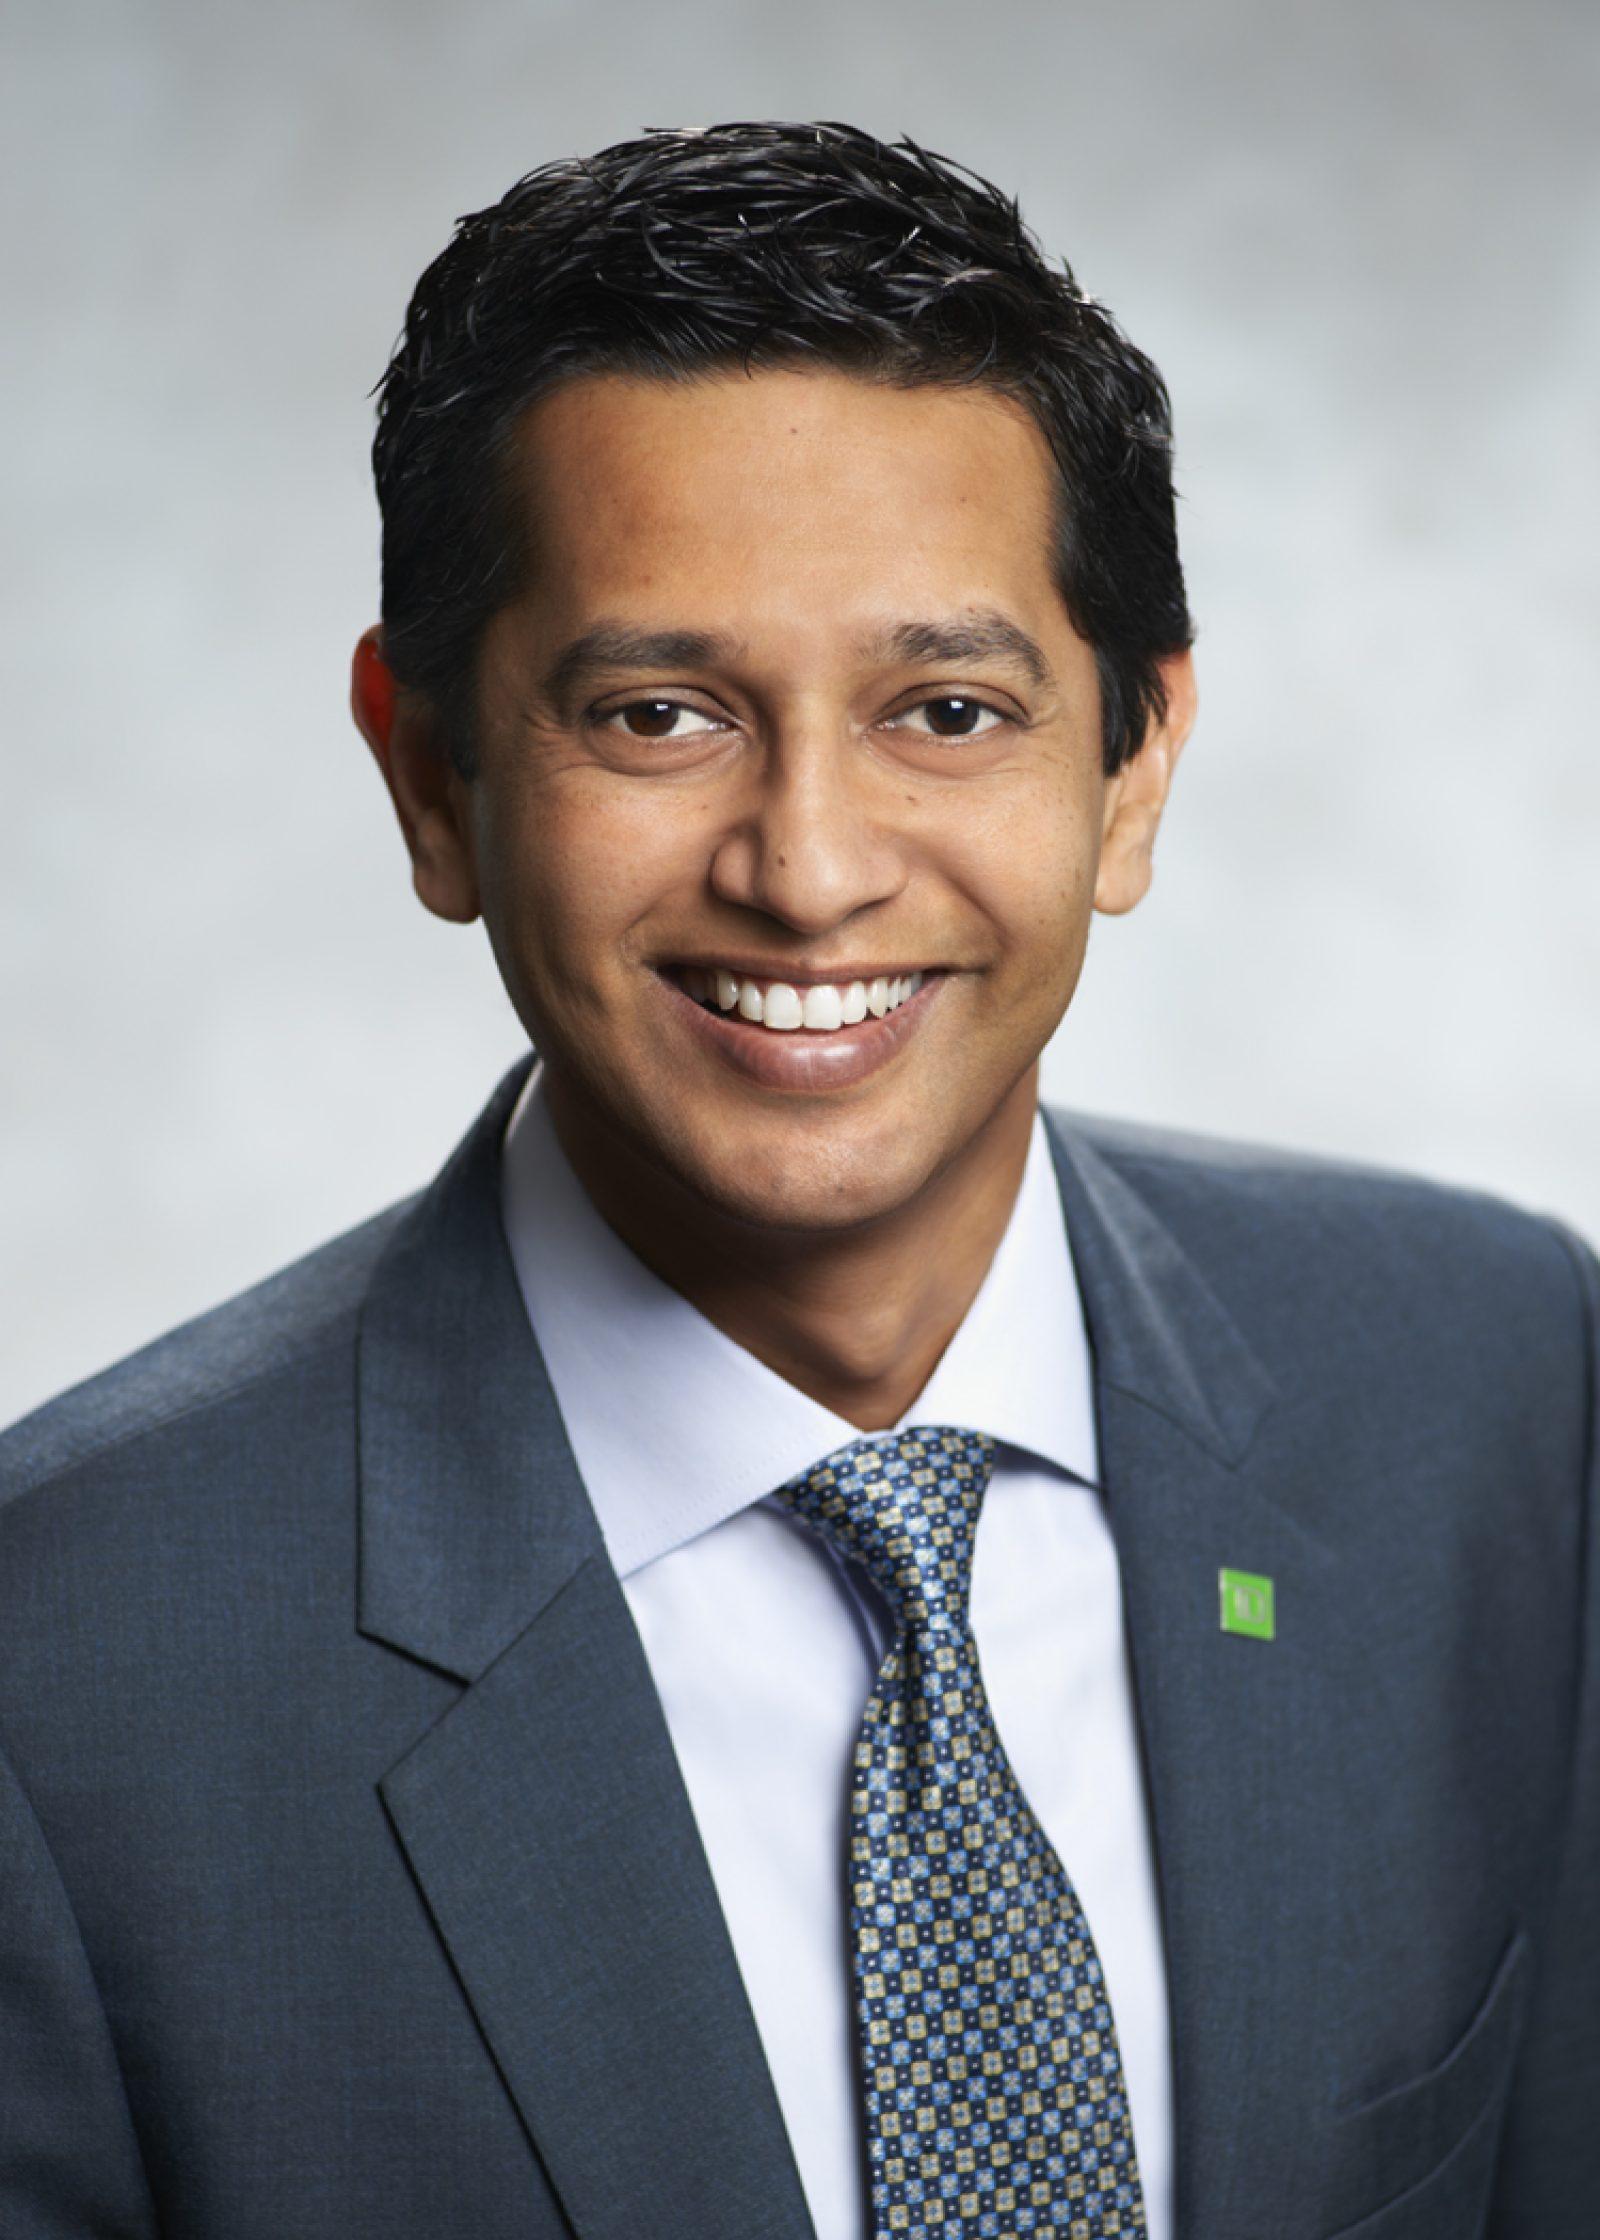 Dinesh Garbharran, Interim CRO, TD Insurance & VP, Risk Management, TD Bank (Advisory Council Member for the Certificate in Risk Management)